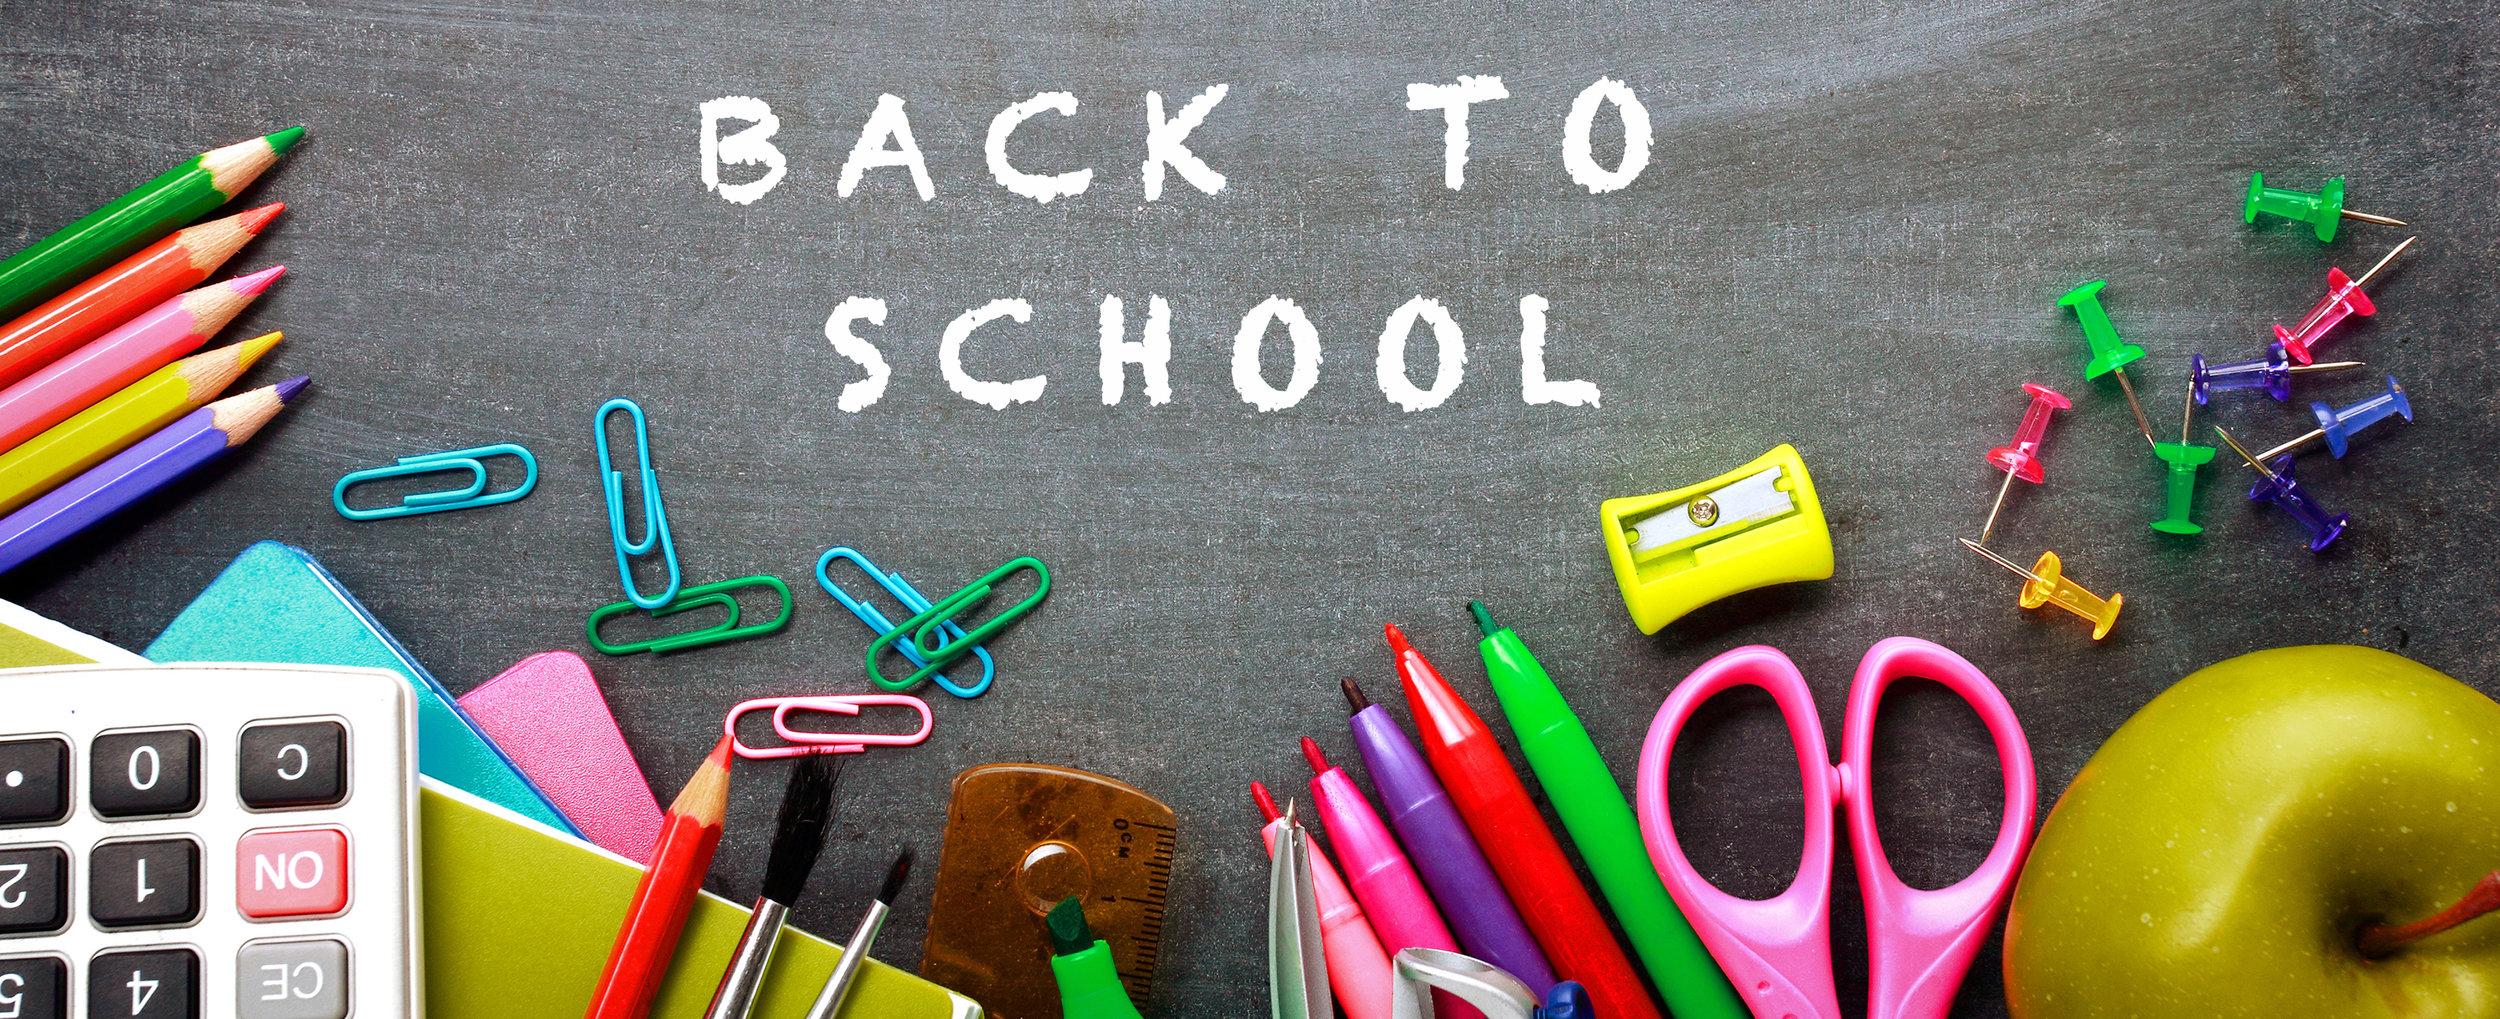 Back_to_school.jpg